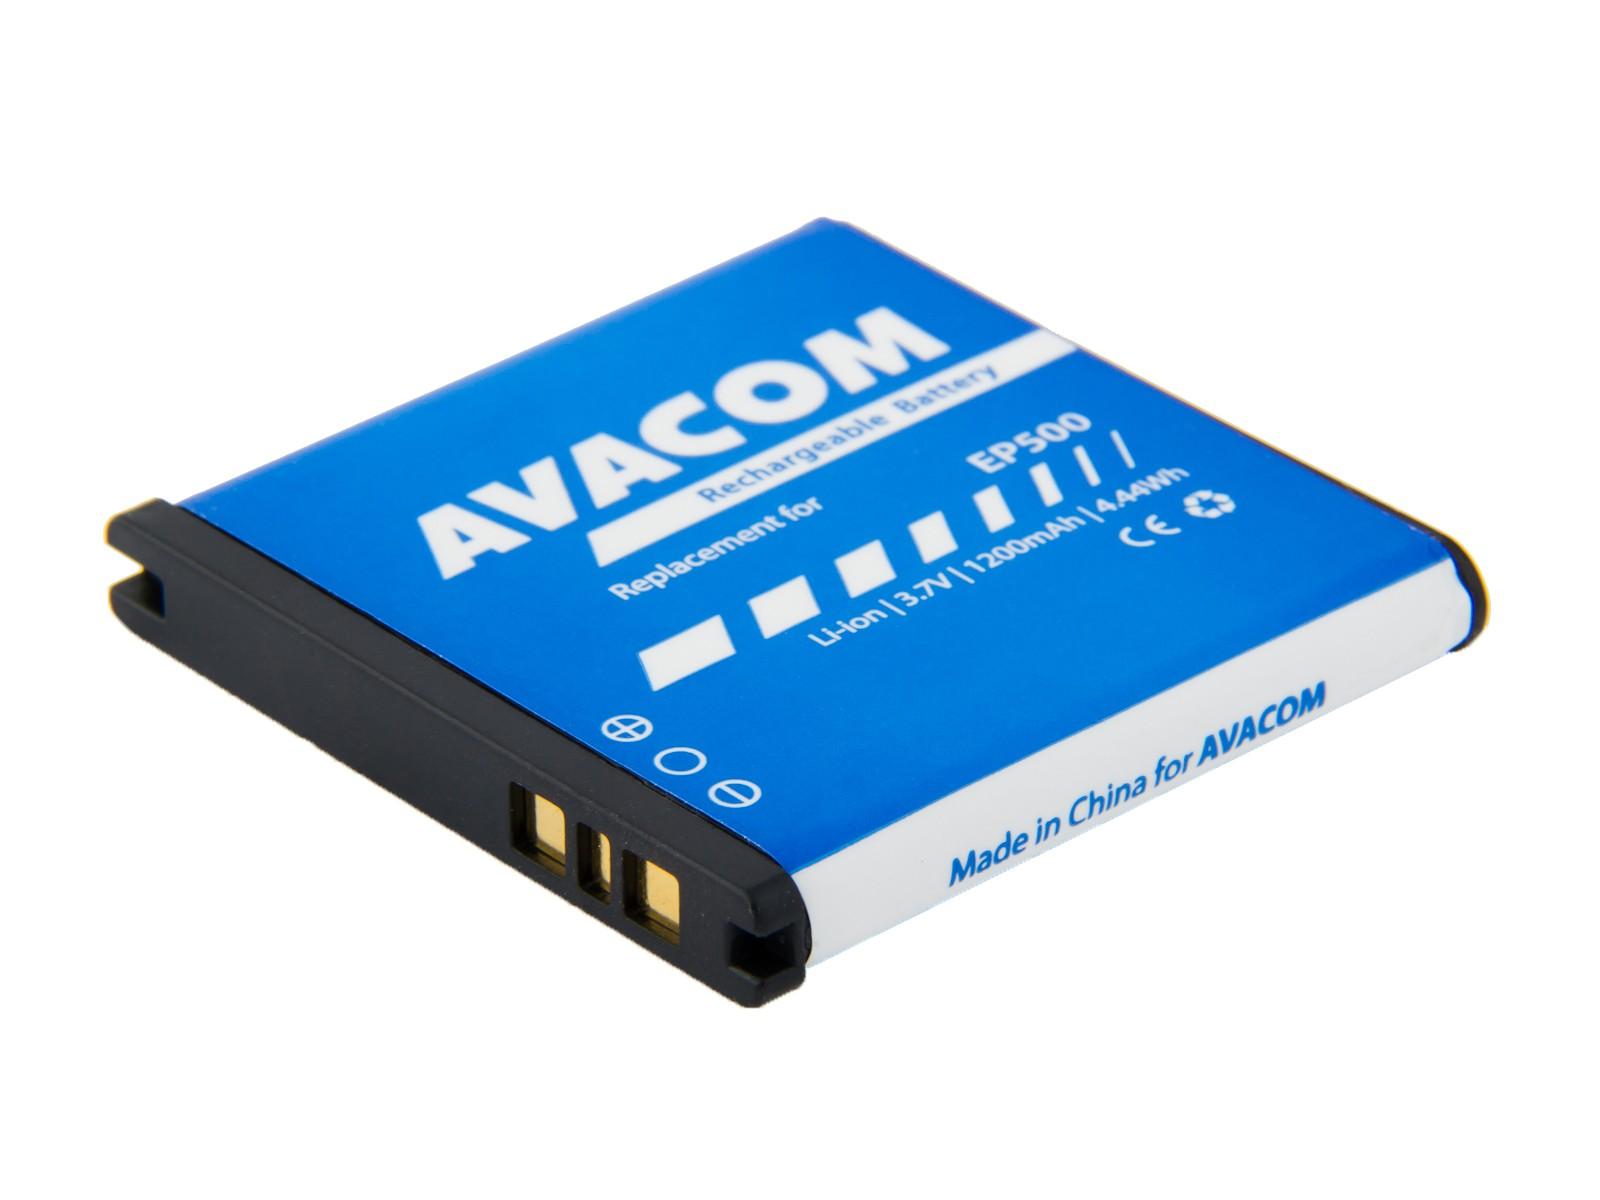 Baterie AVACOM GSSE-EP500-1200 do mobilu Sony Ericsson Xperia mini Li-Ion 3,7V 1200mAh